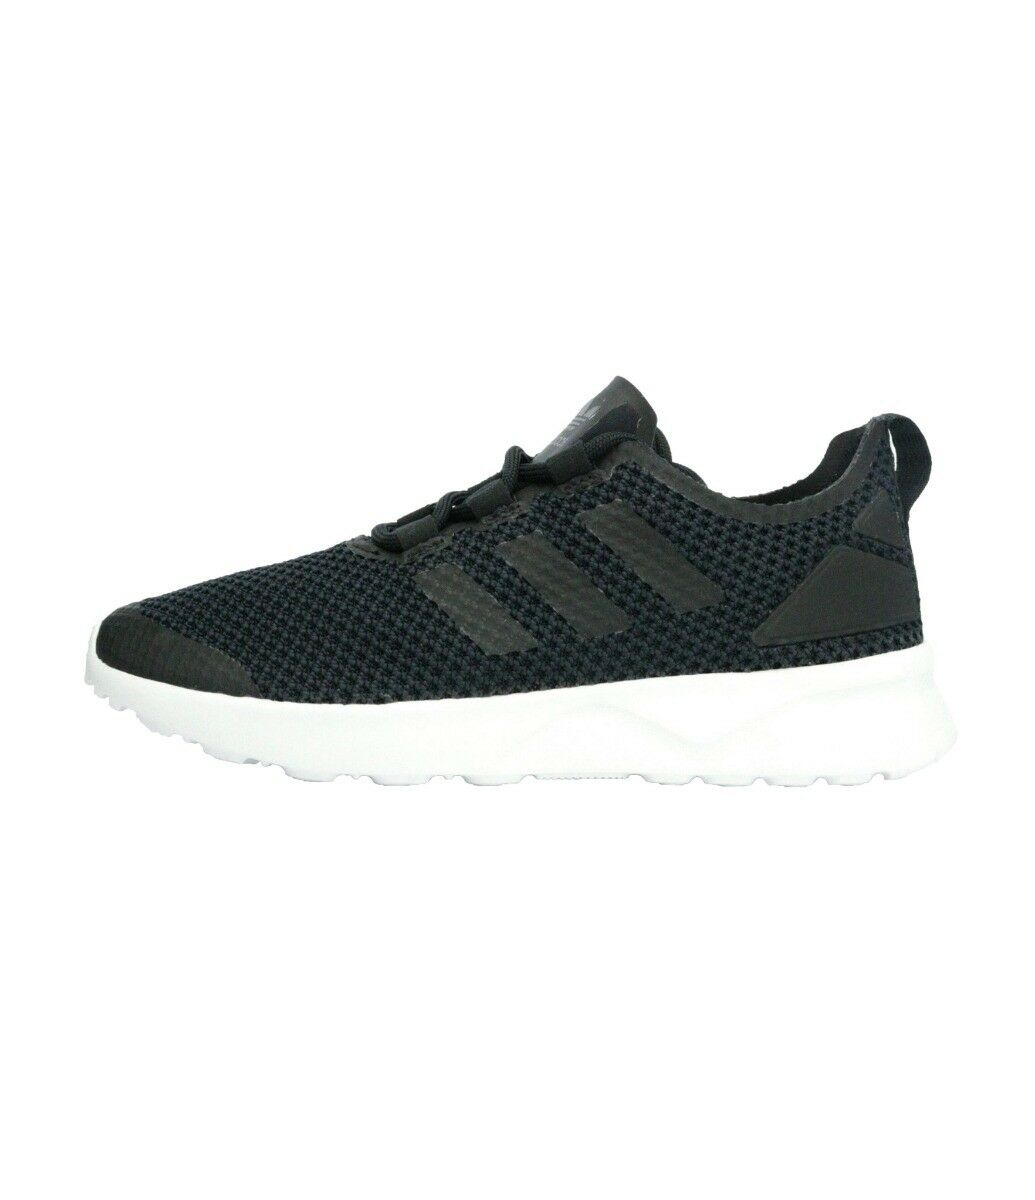 best sneakers 3eb8e c1fd1 adidas ZX FLUX ADV VERVE VERVE VERVE Womens Trainer Shoe Black White Size 5  New 38ef2a